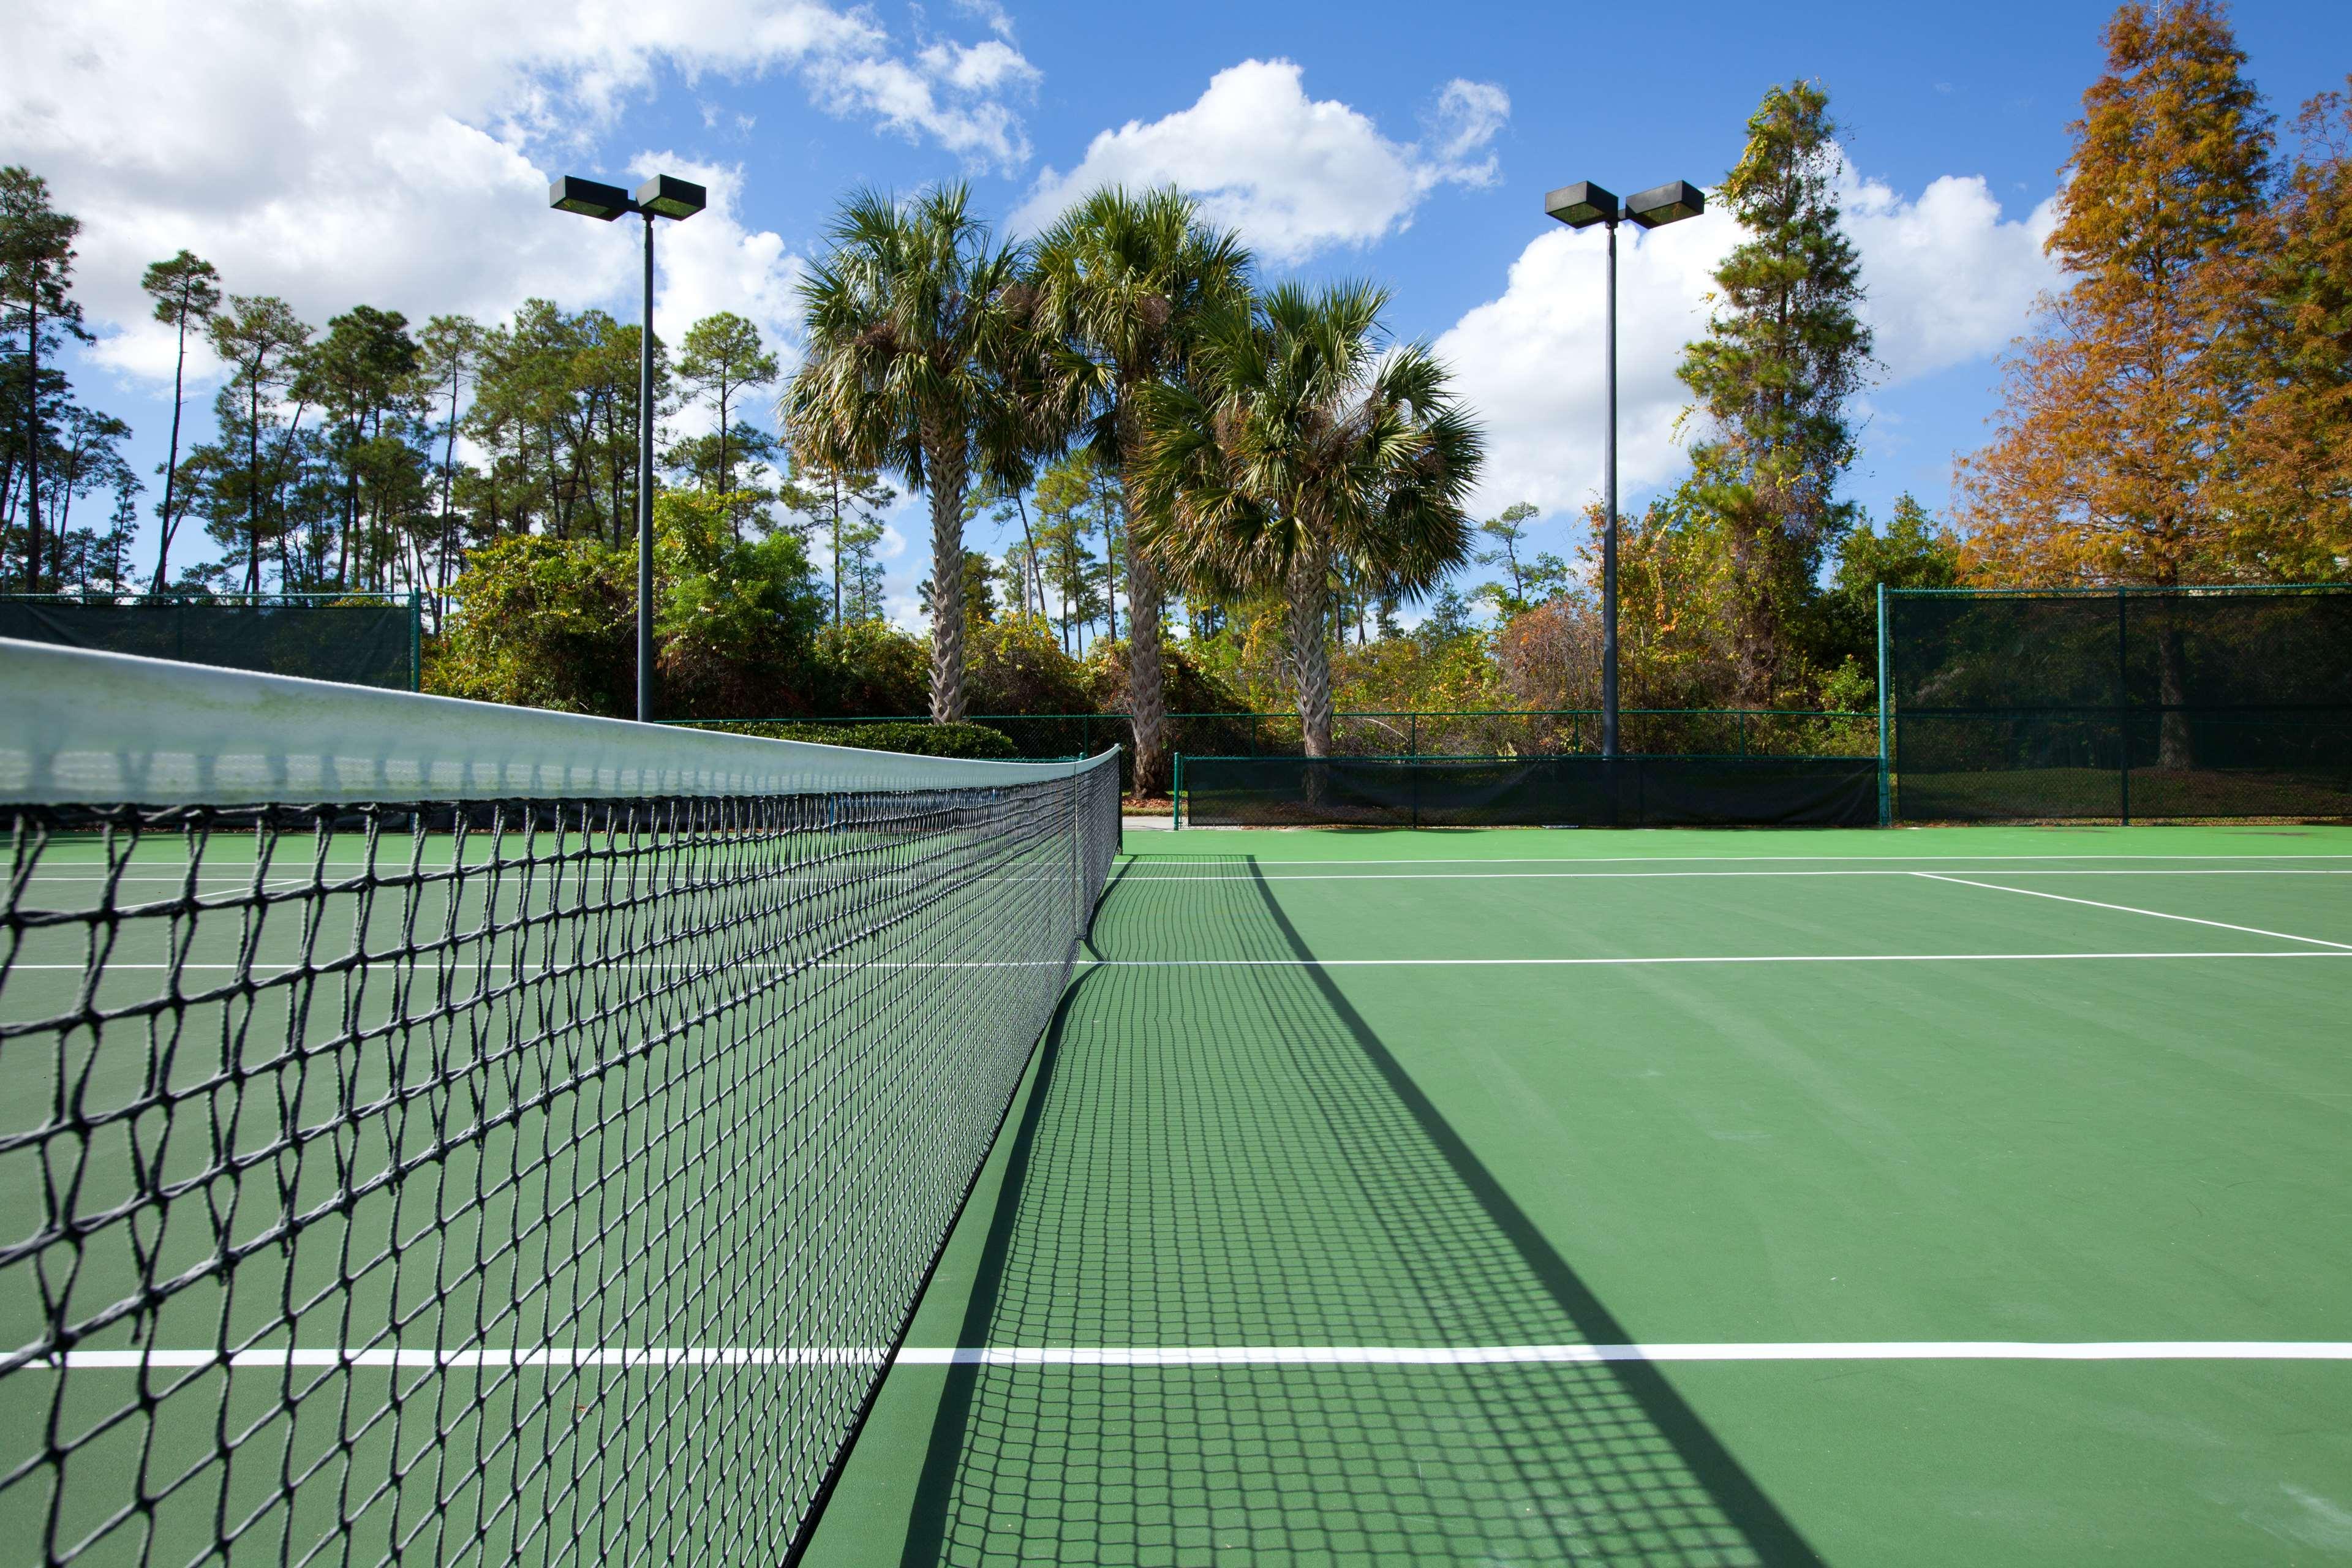 Tennis Courts.